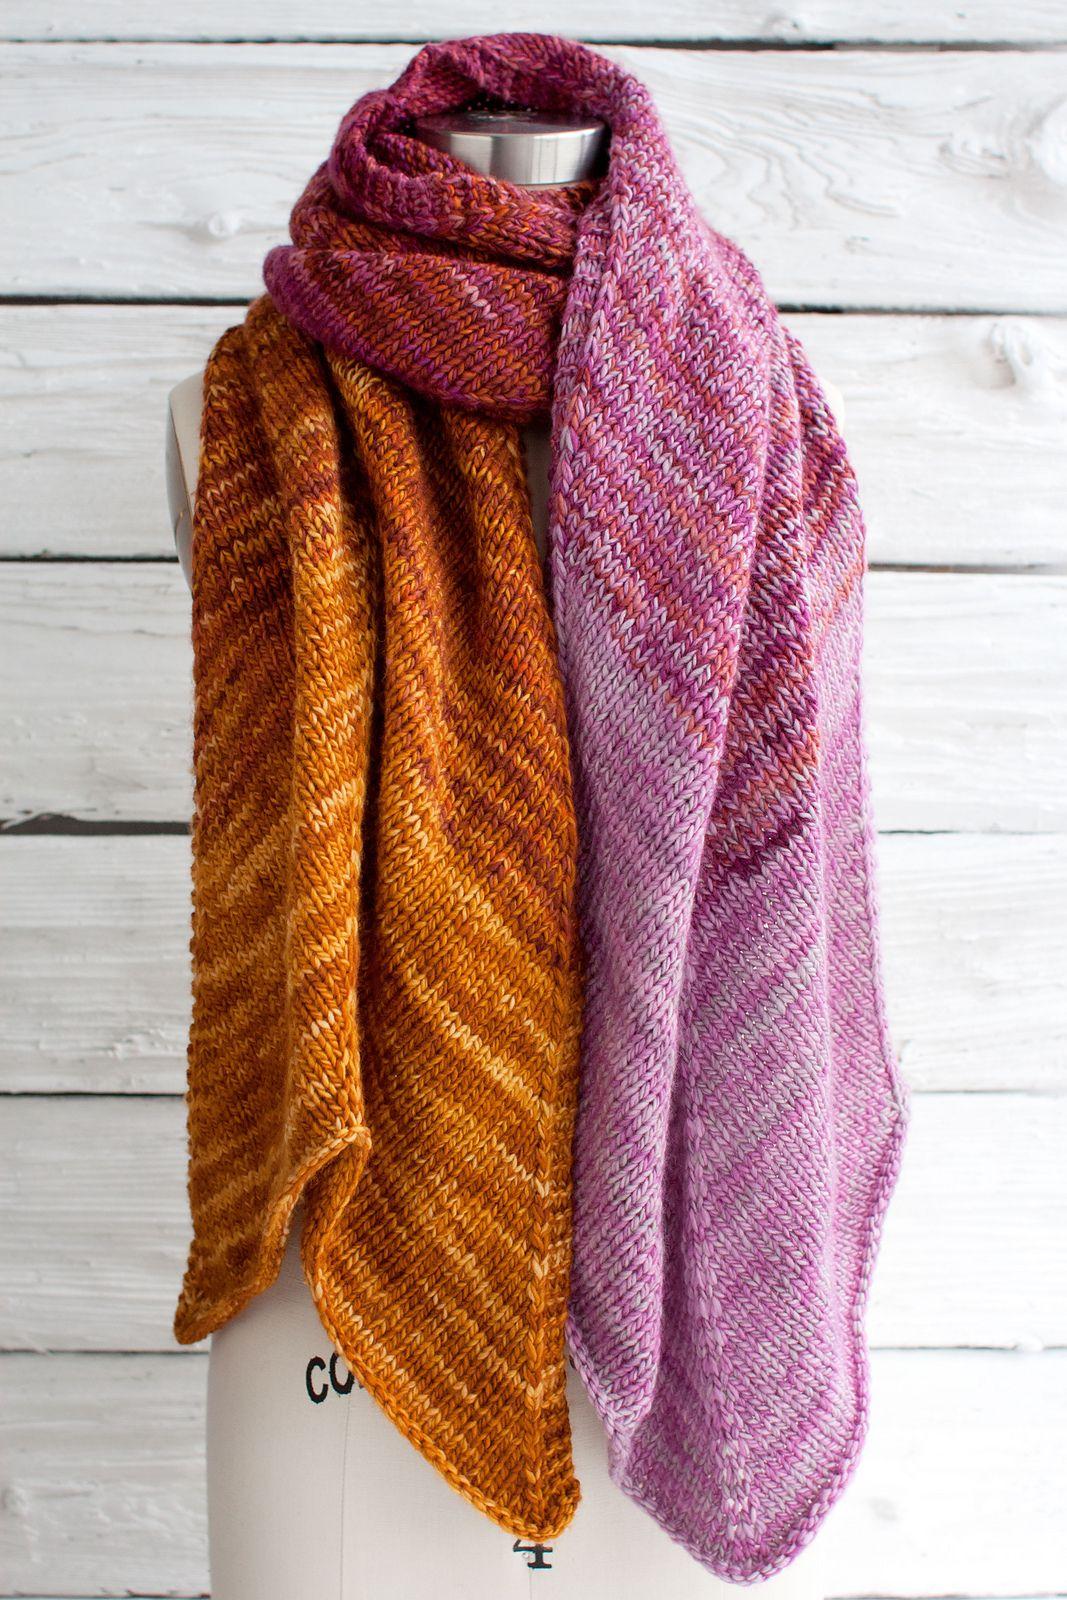 Pradera wrap by jocelyn tunney free knitted pattern ravelry pradera wrap by jocelyn tunney free knitted pattern ravelry bankloansurffo Choice Image